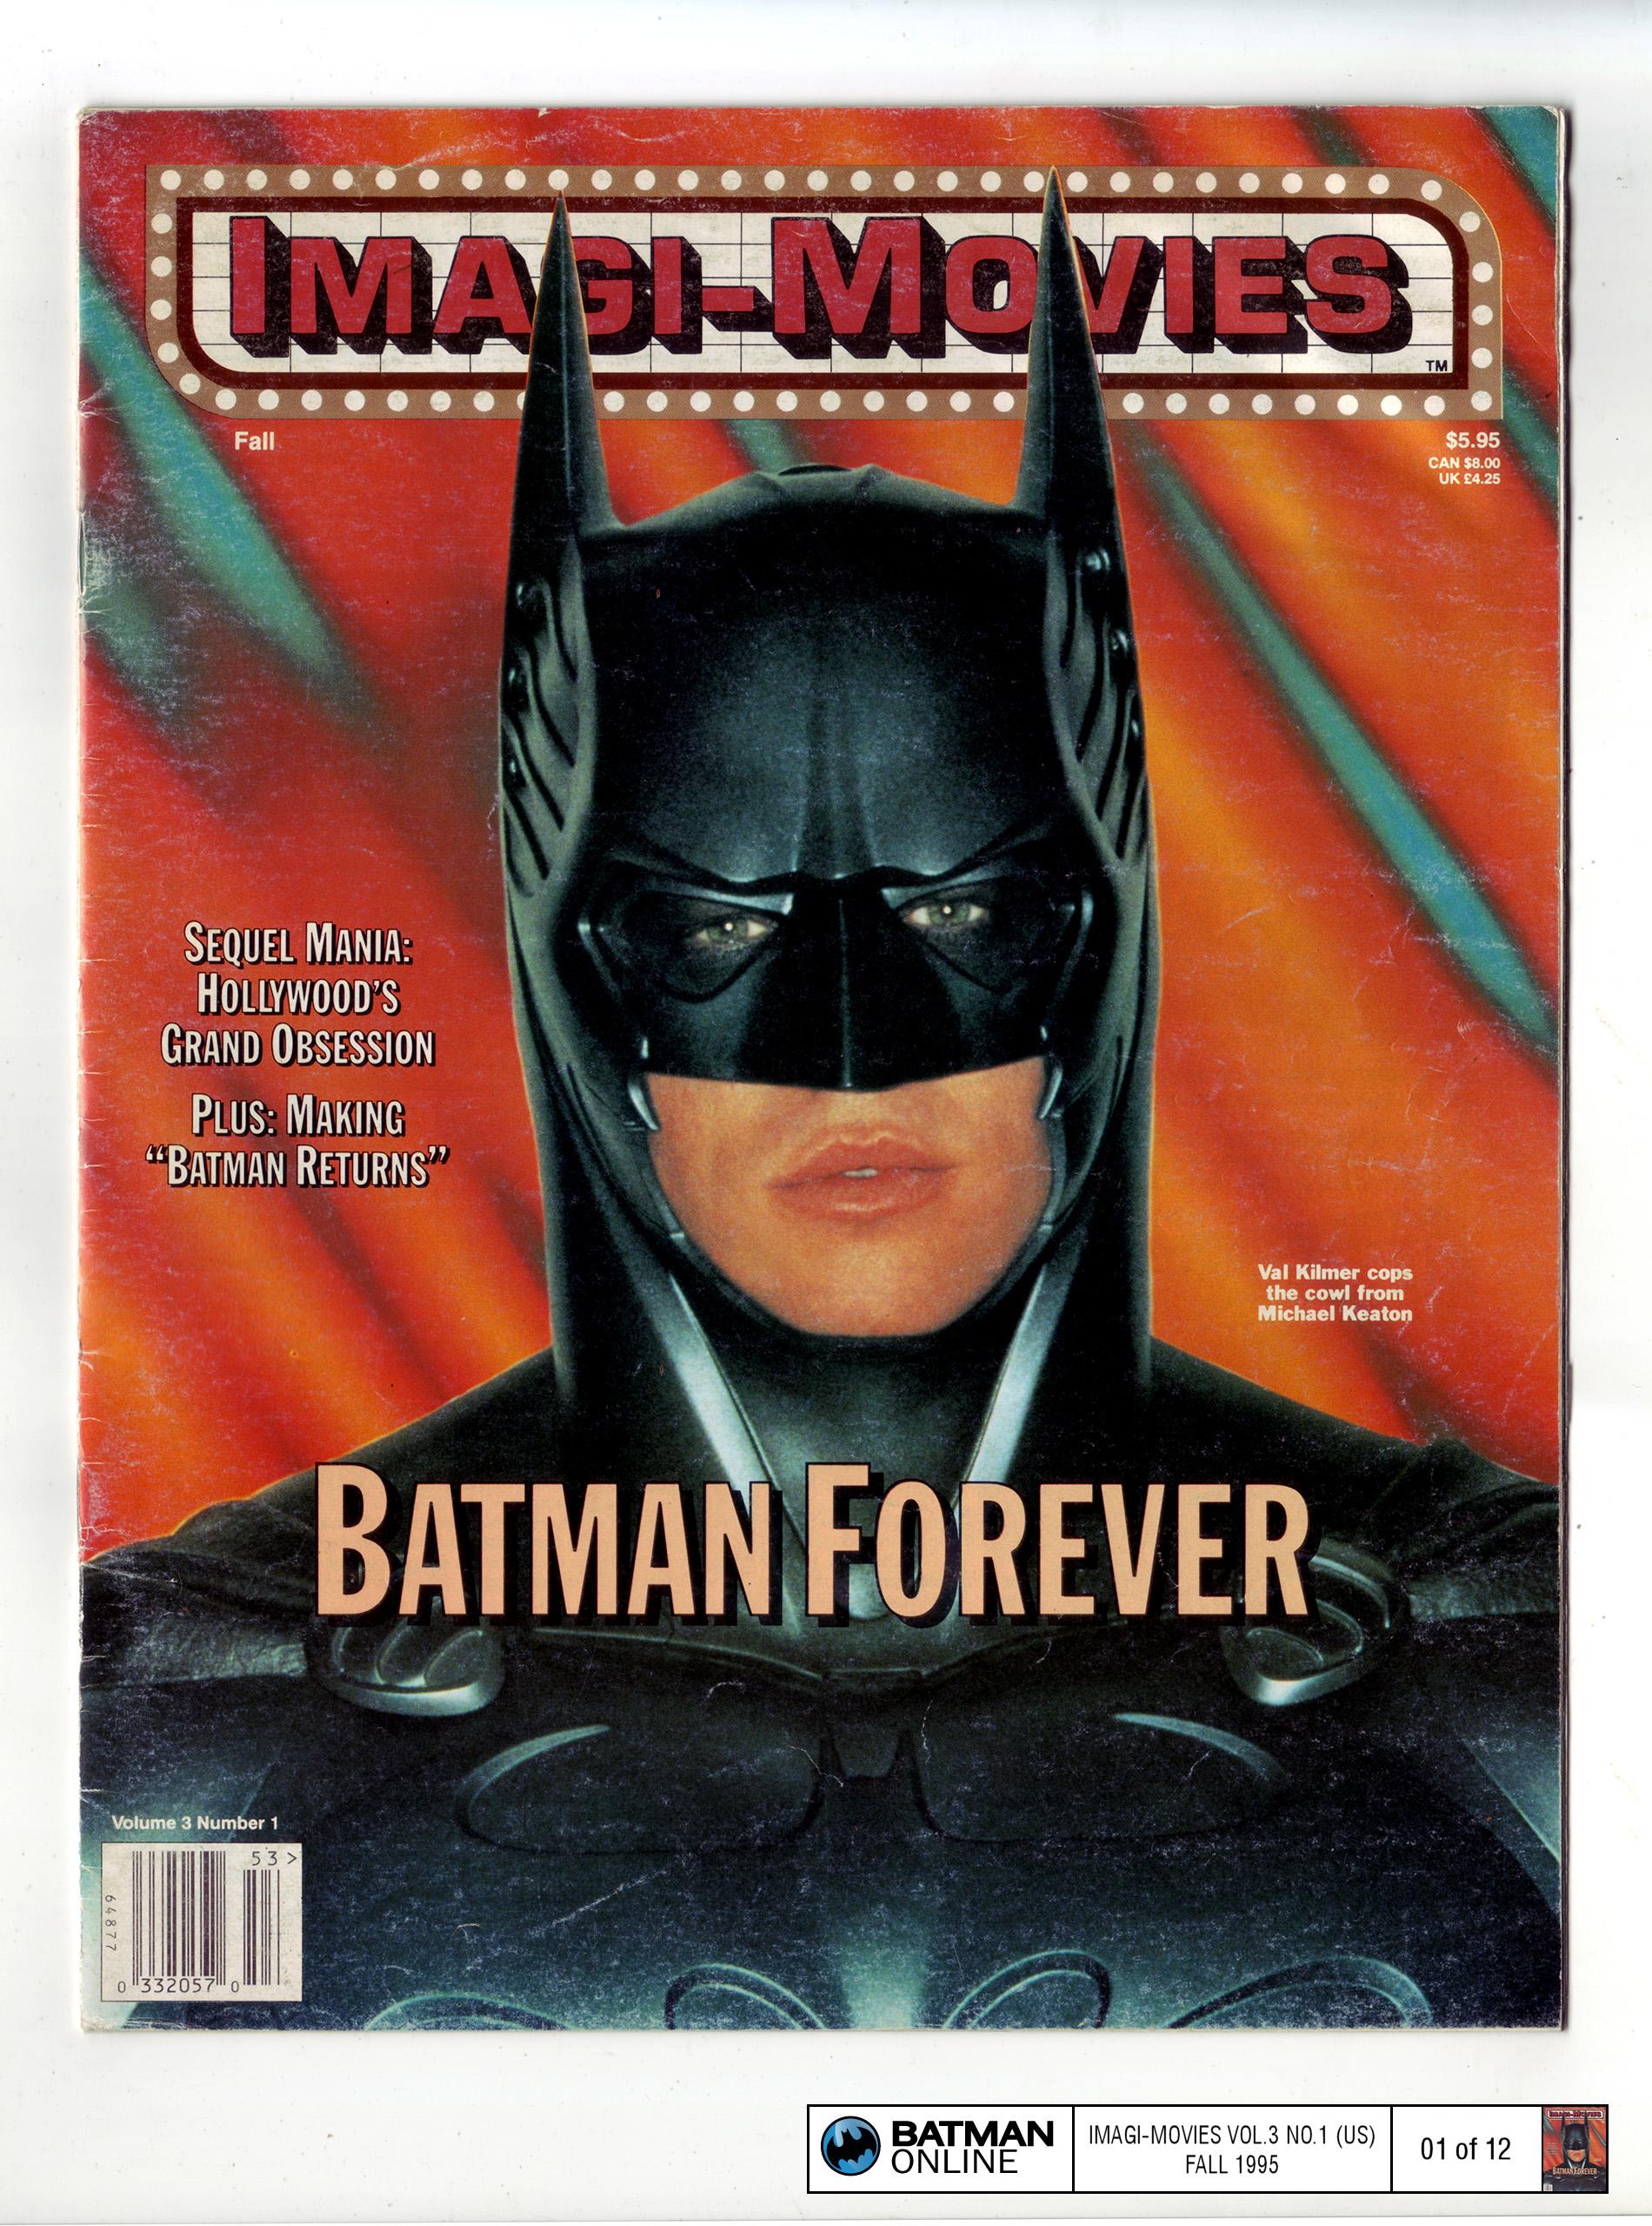 batman online gallery imagimovies us volume 3